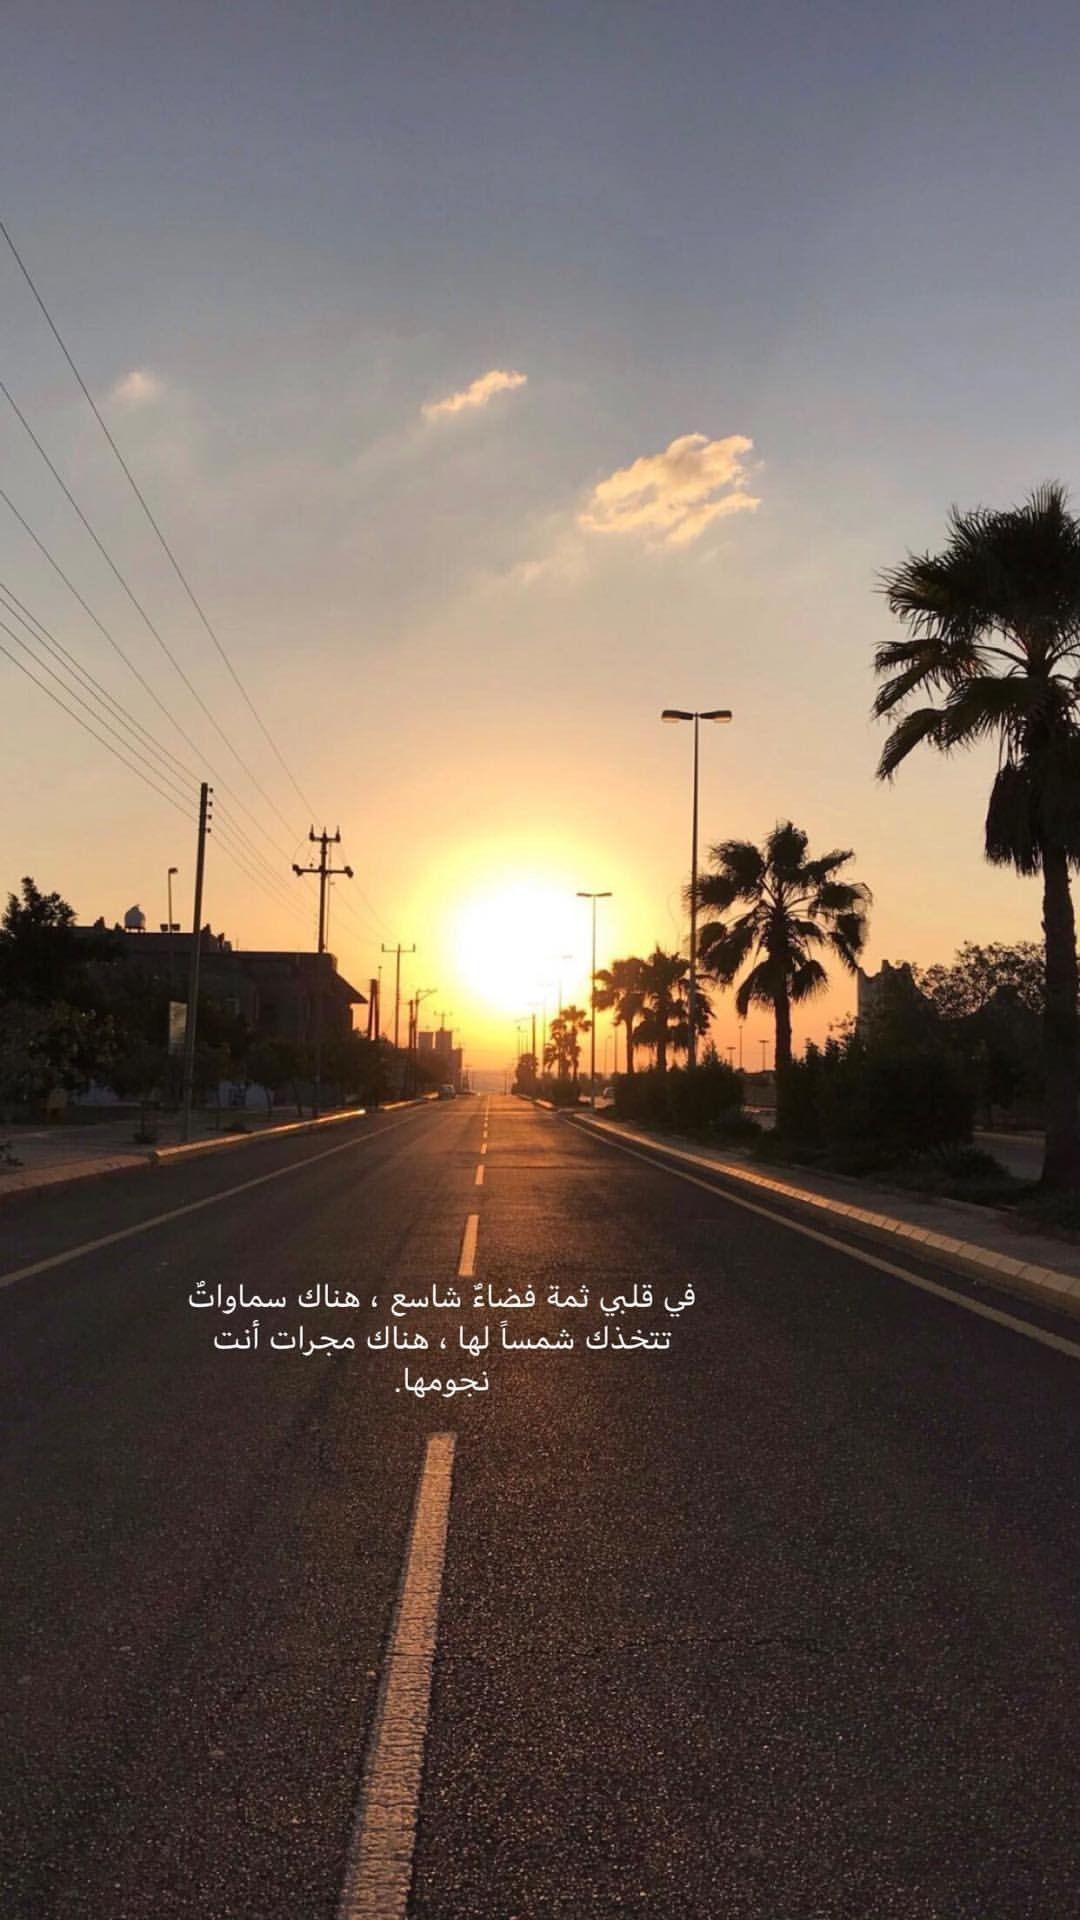 اقتباسات Sky Photography Nature Cover Photo Quotes Quran Quotes Love